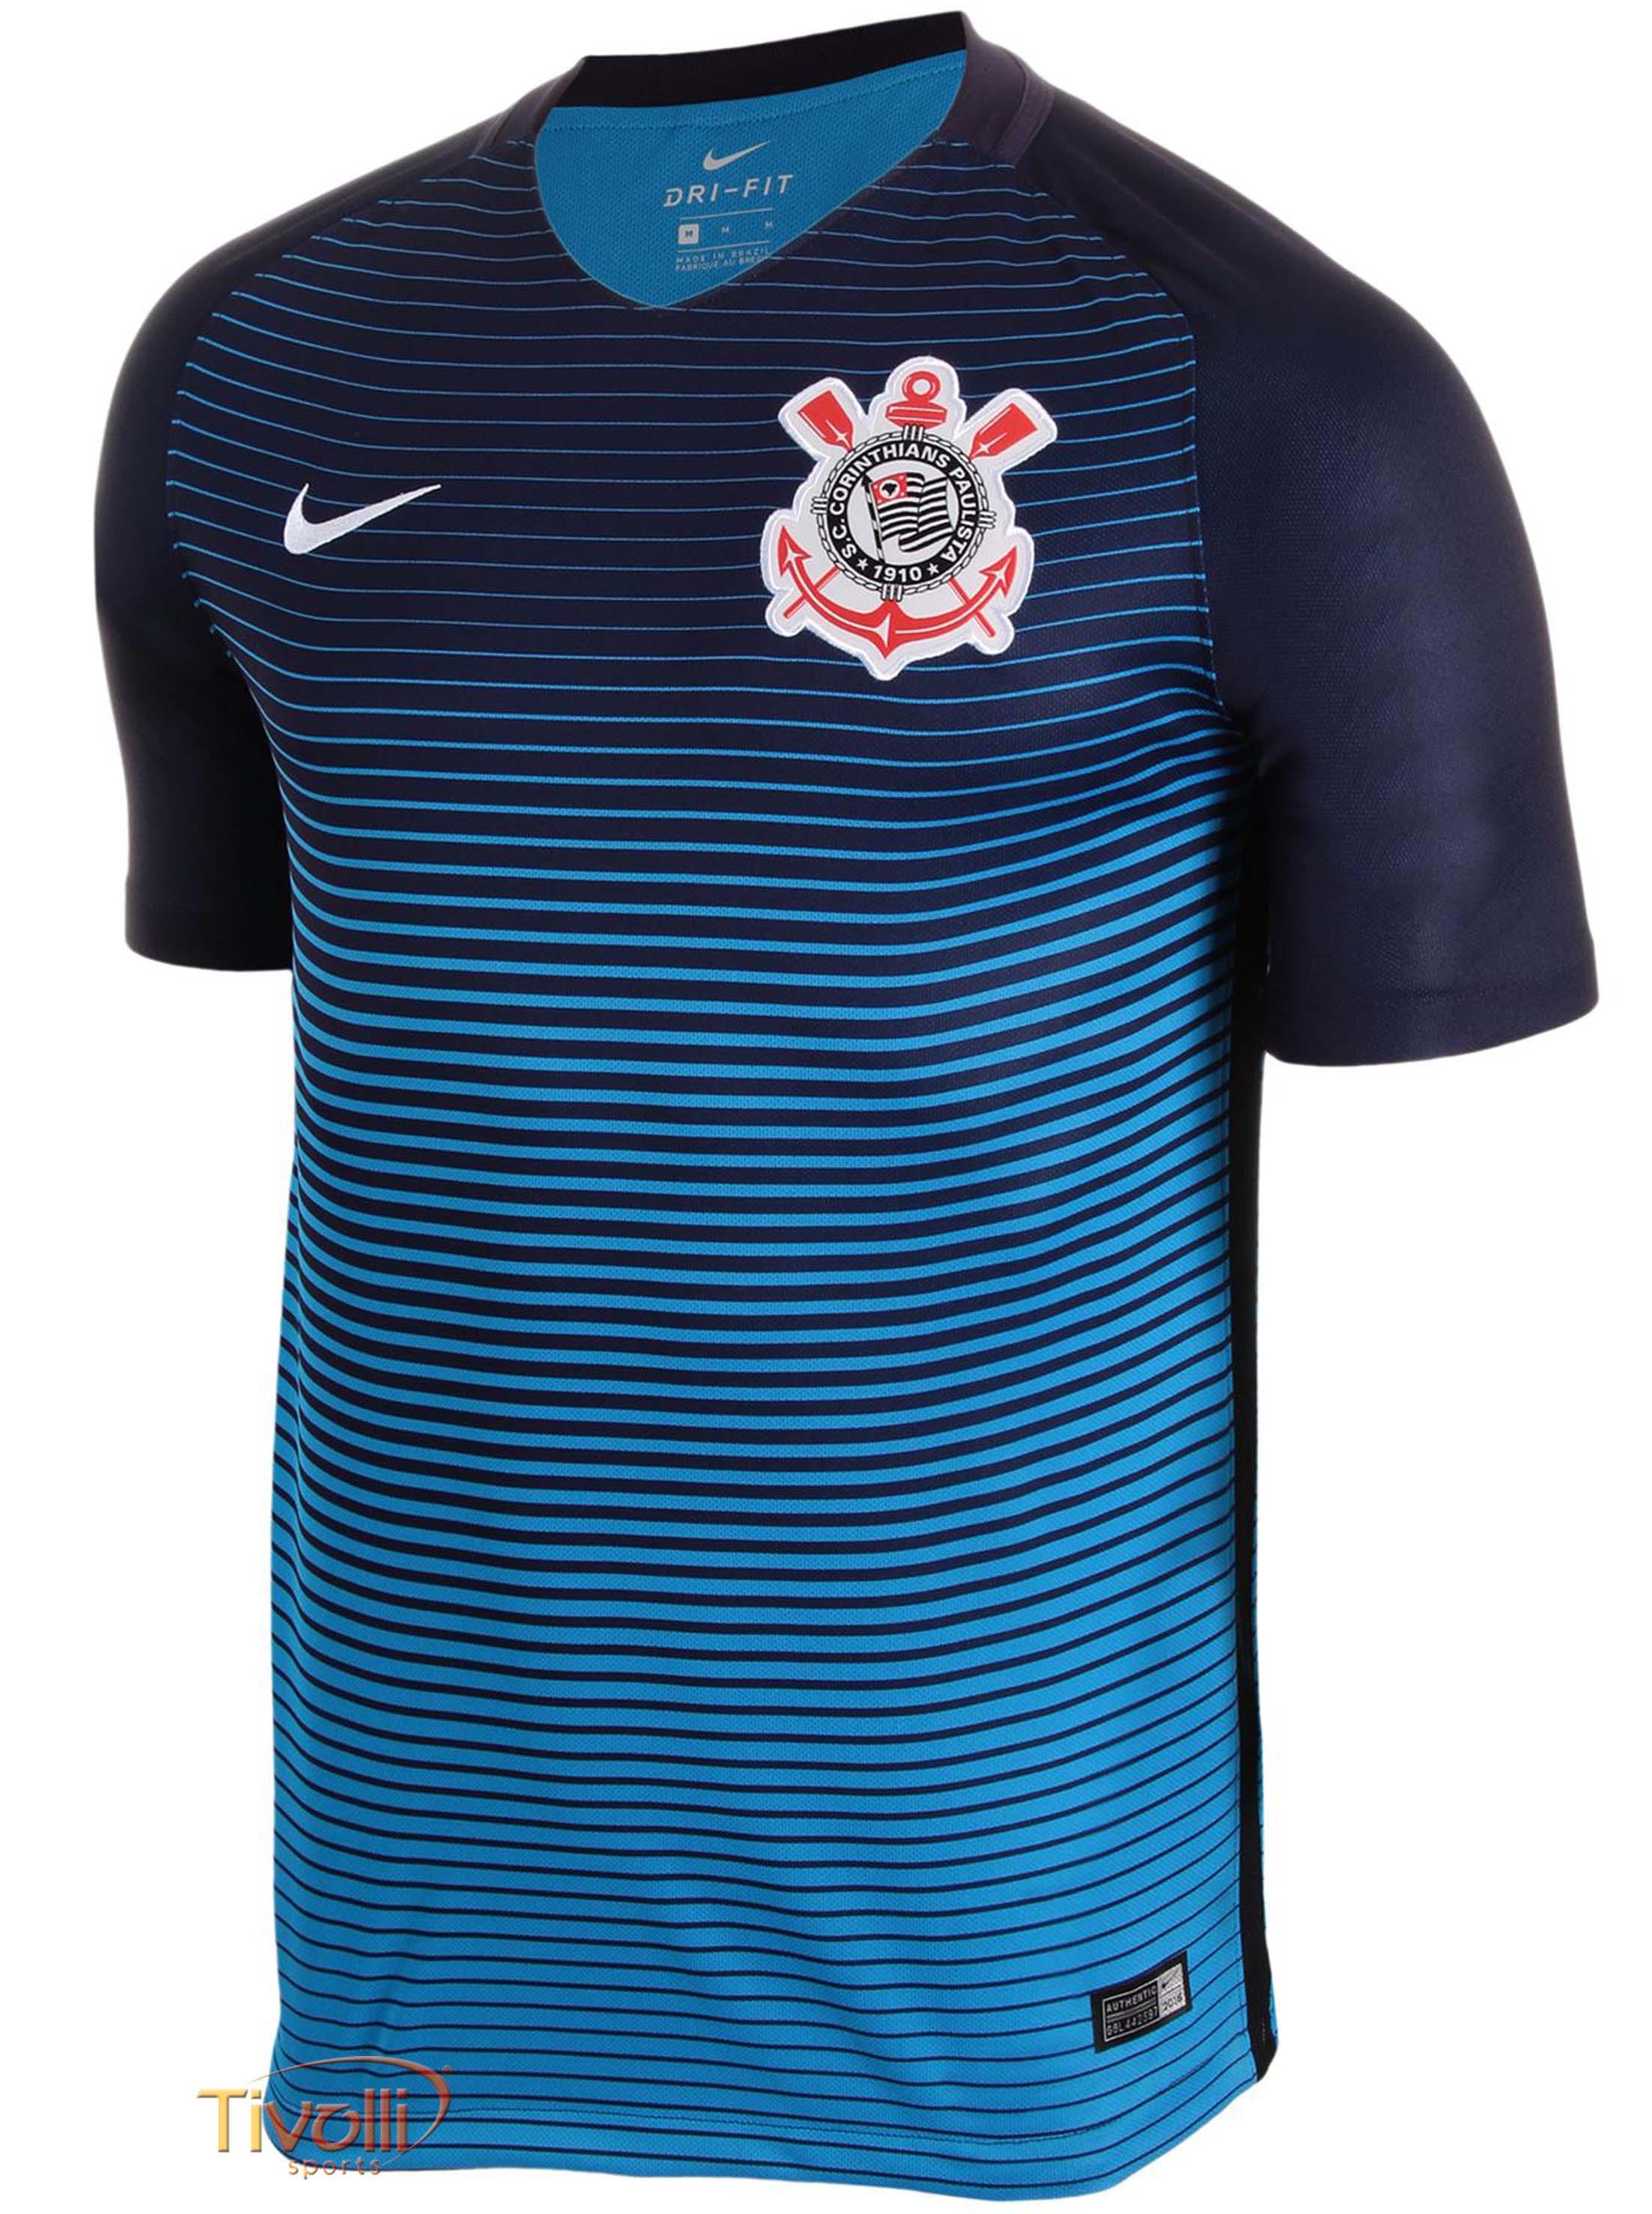 5a93c389ff84e Camiseta Nike Corinthians III 2016 2017 Torcedor Juvenil   Azul